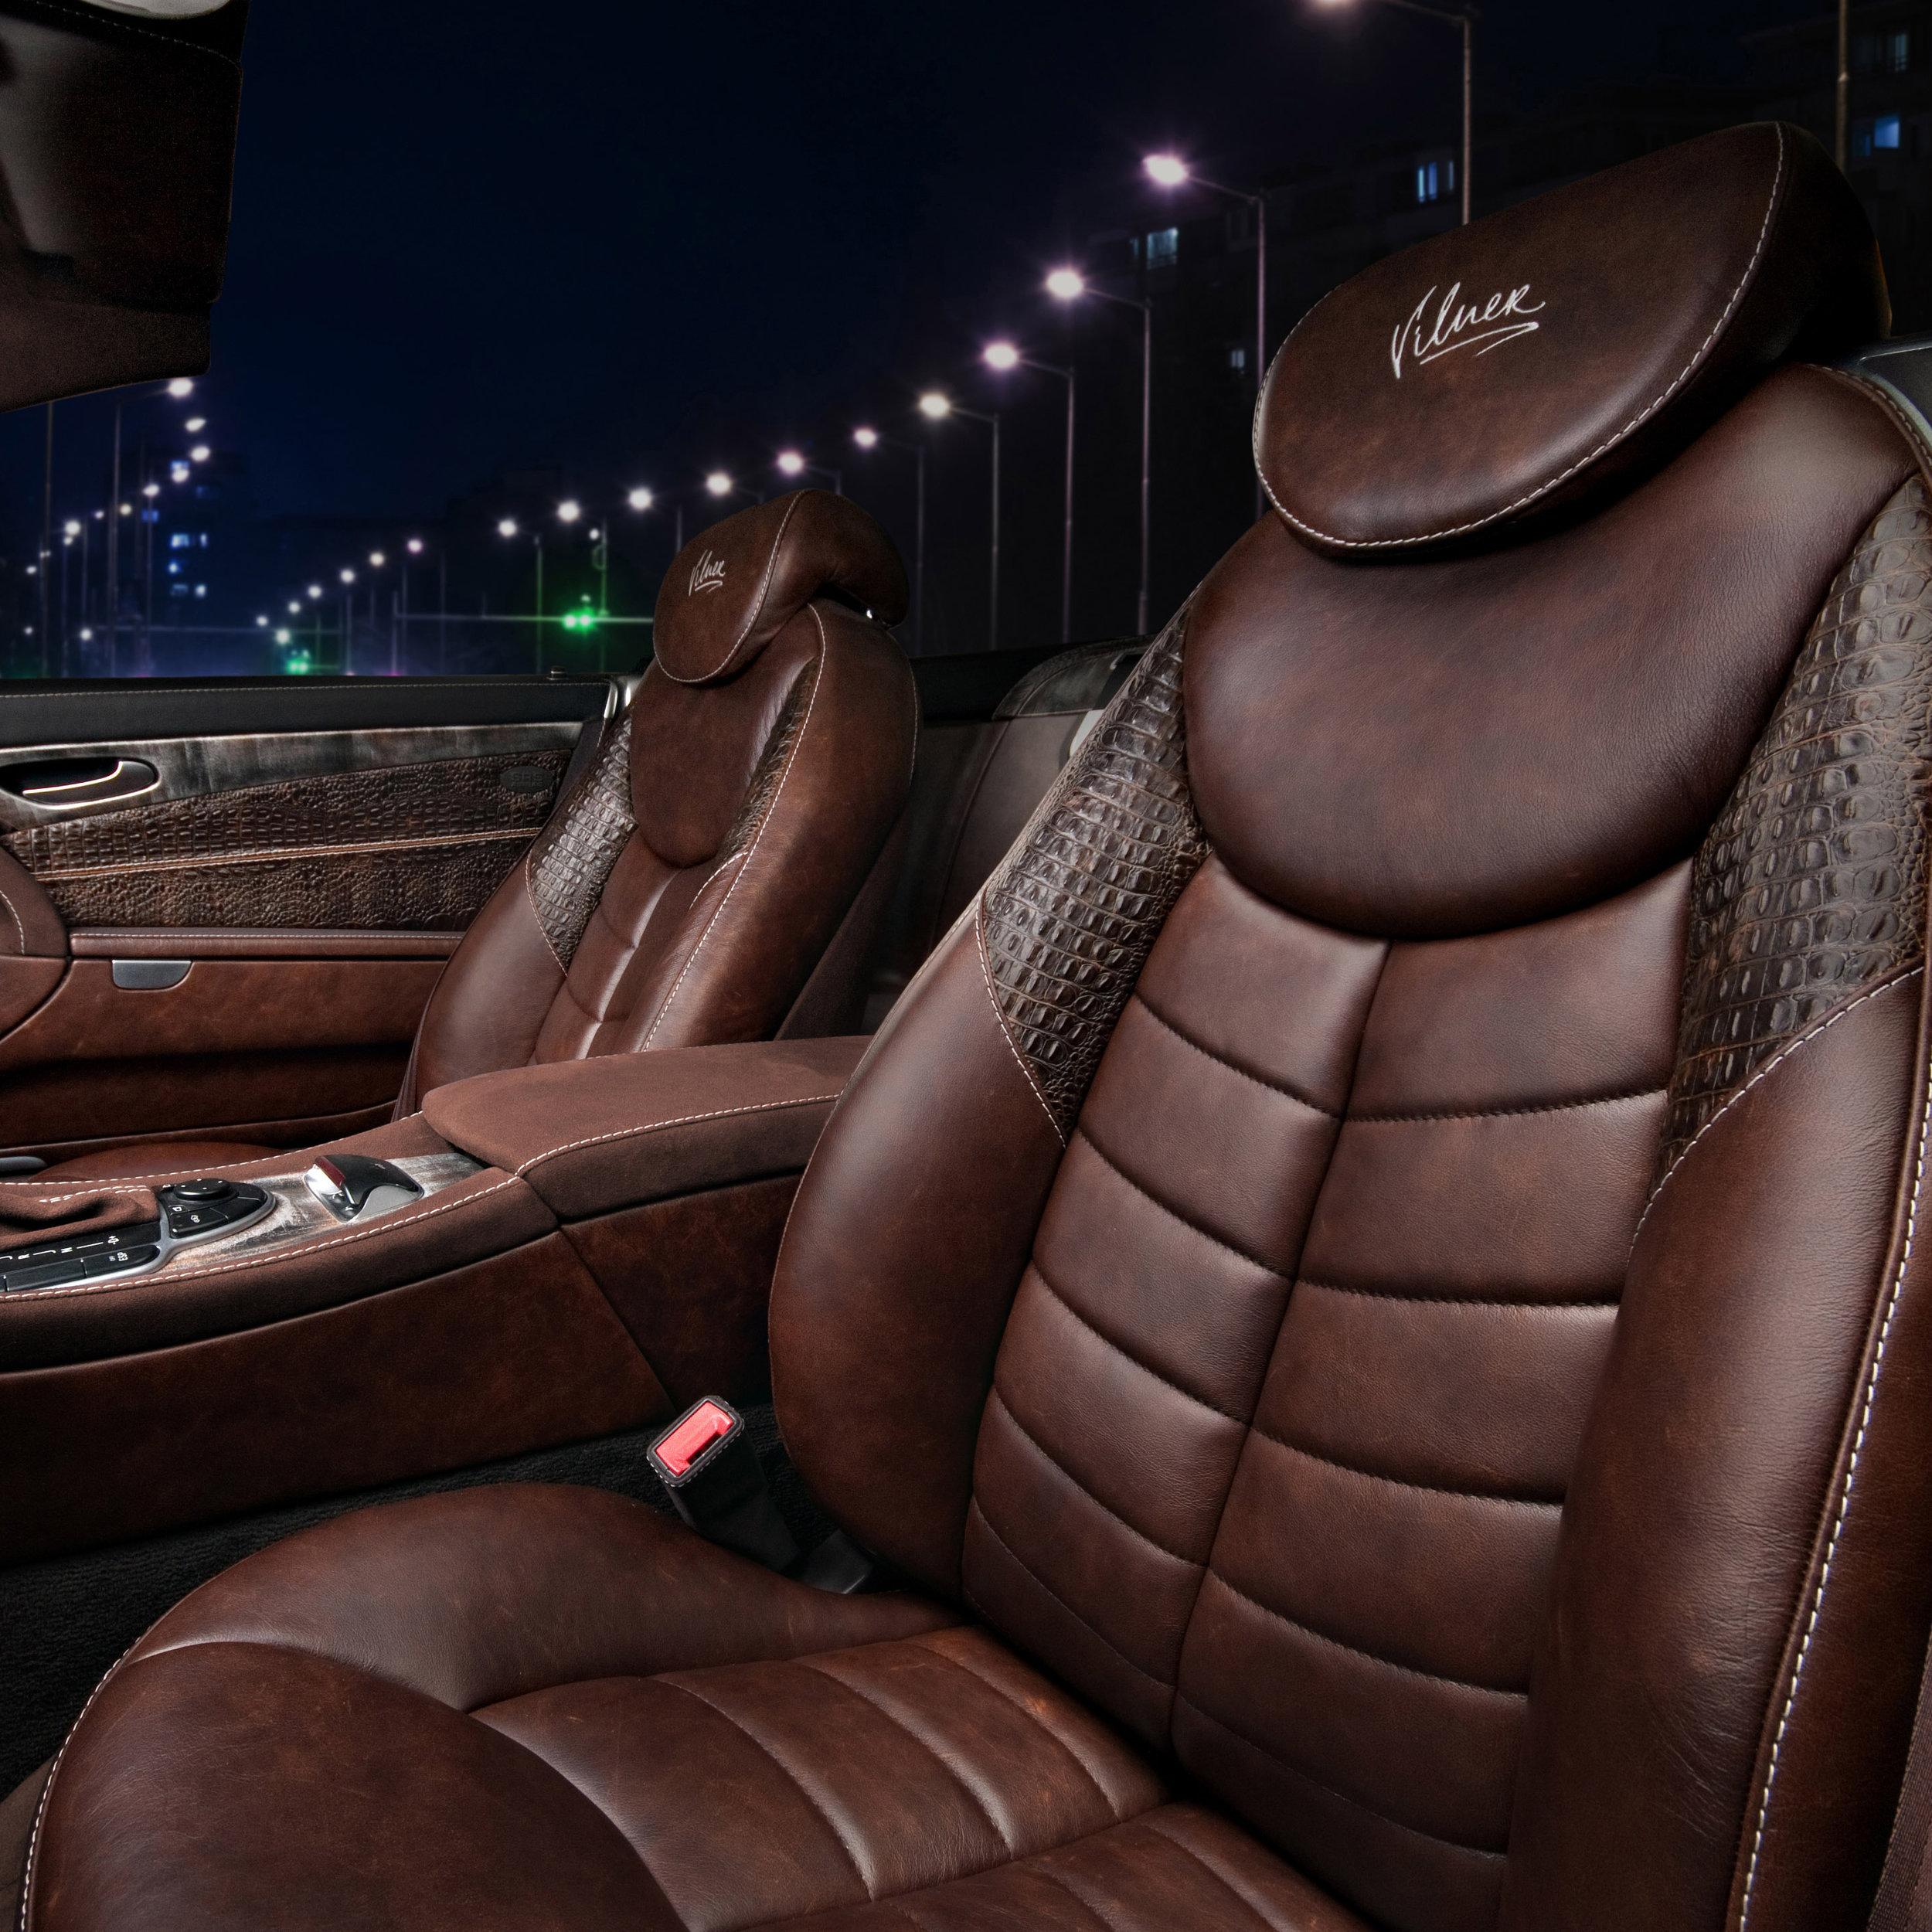 Redefining Luxury Auto Interiors With Vilner Customs - 11/3/17